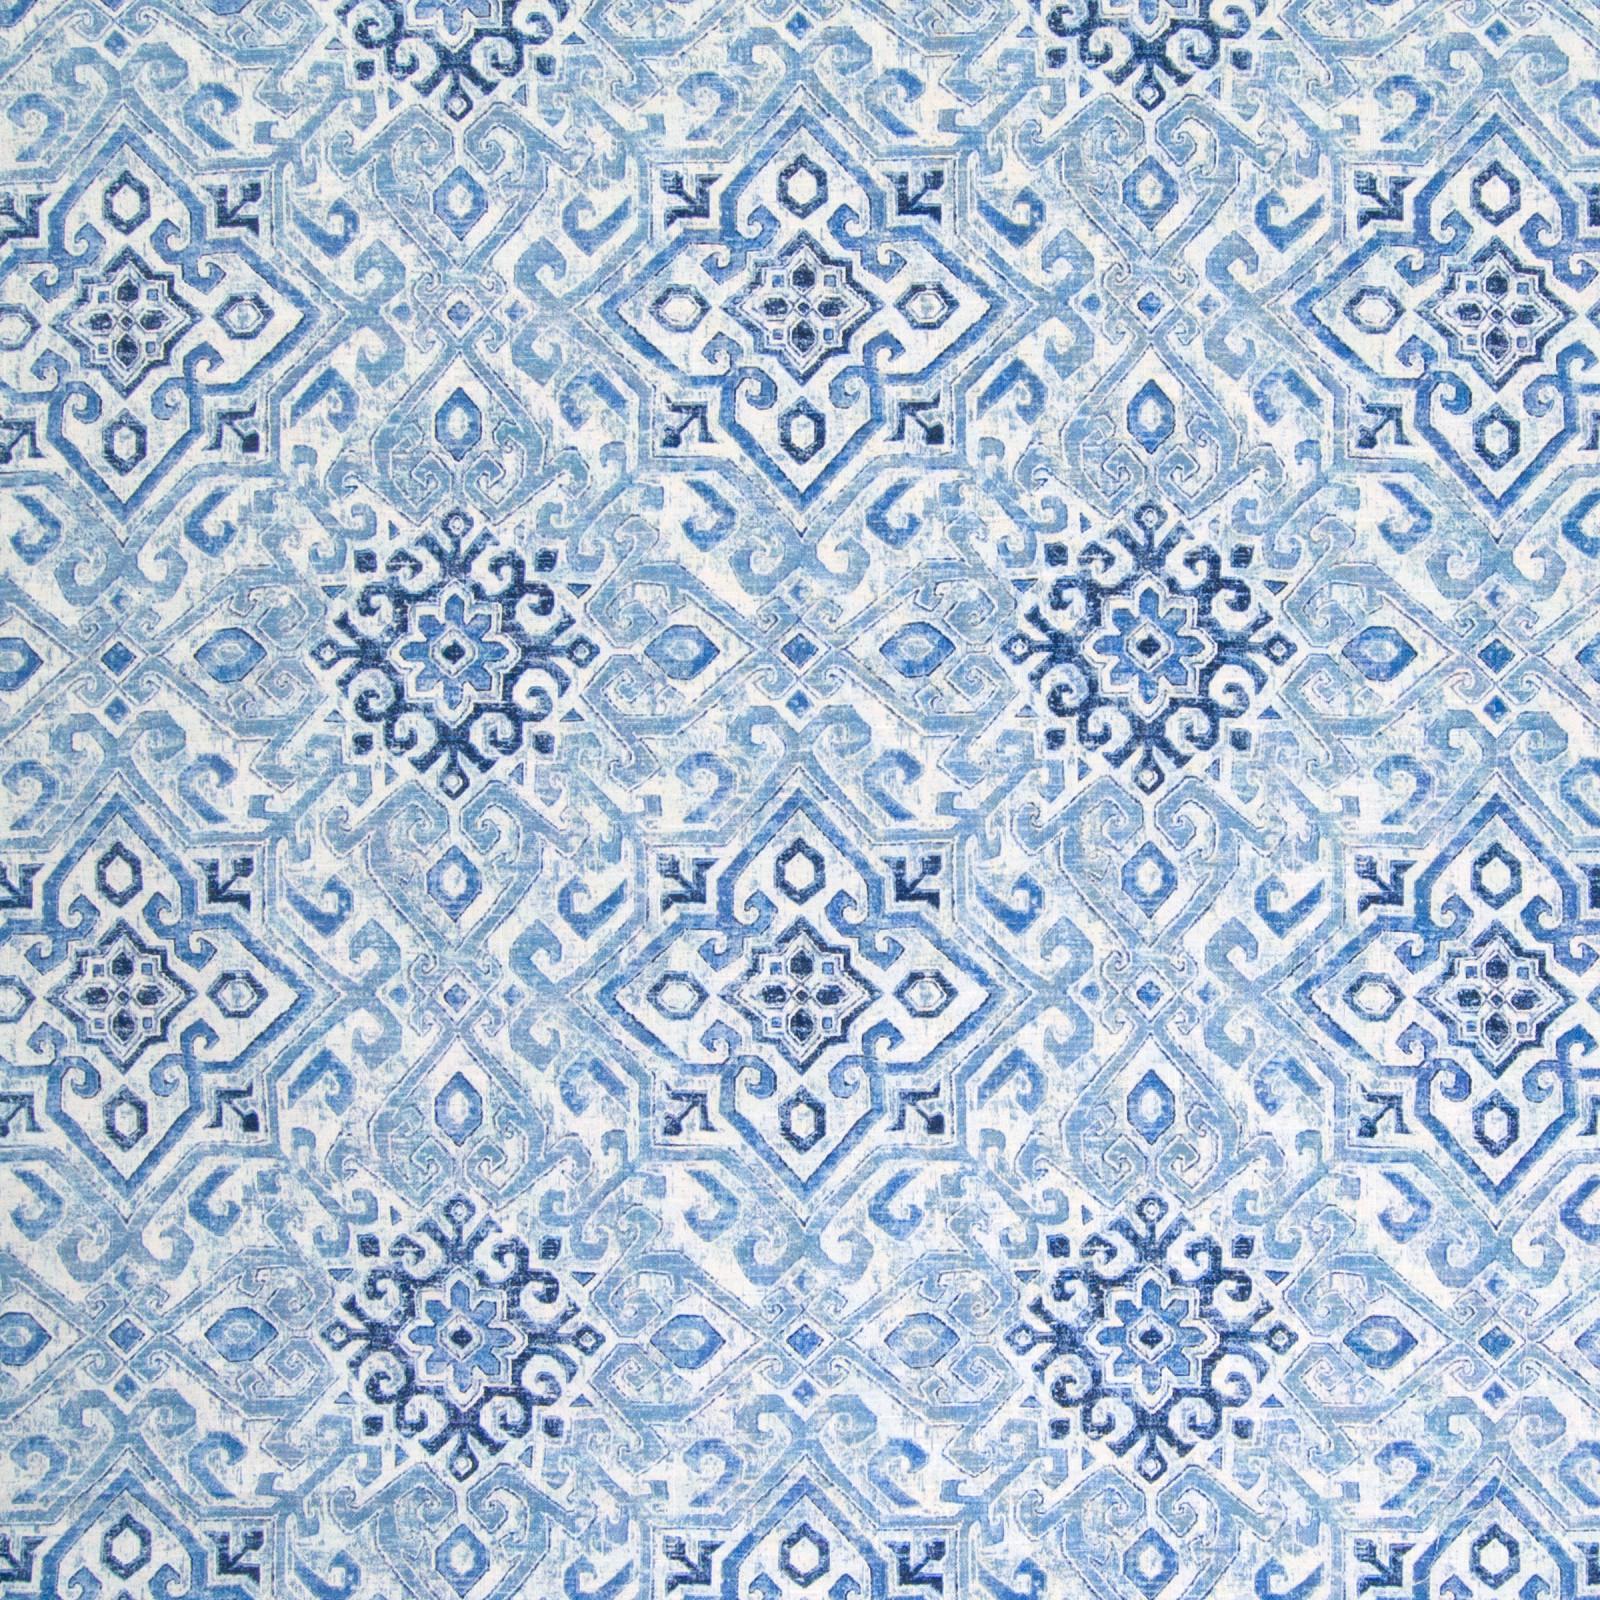 B5732 Marine Greenhouse Fabrics